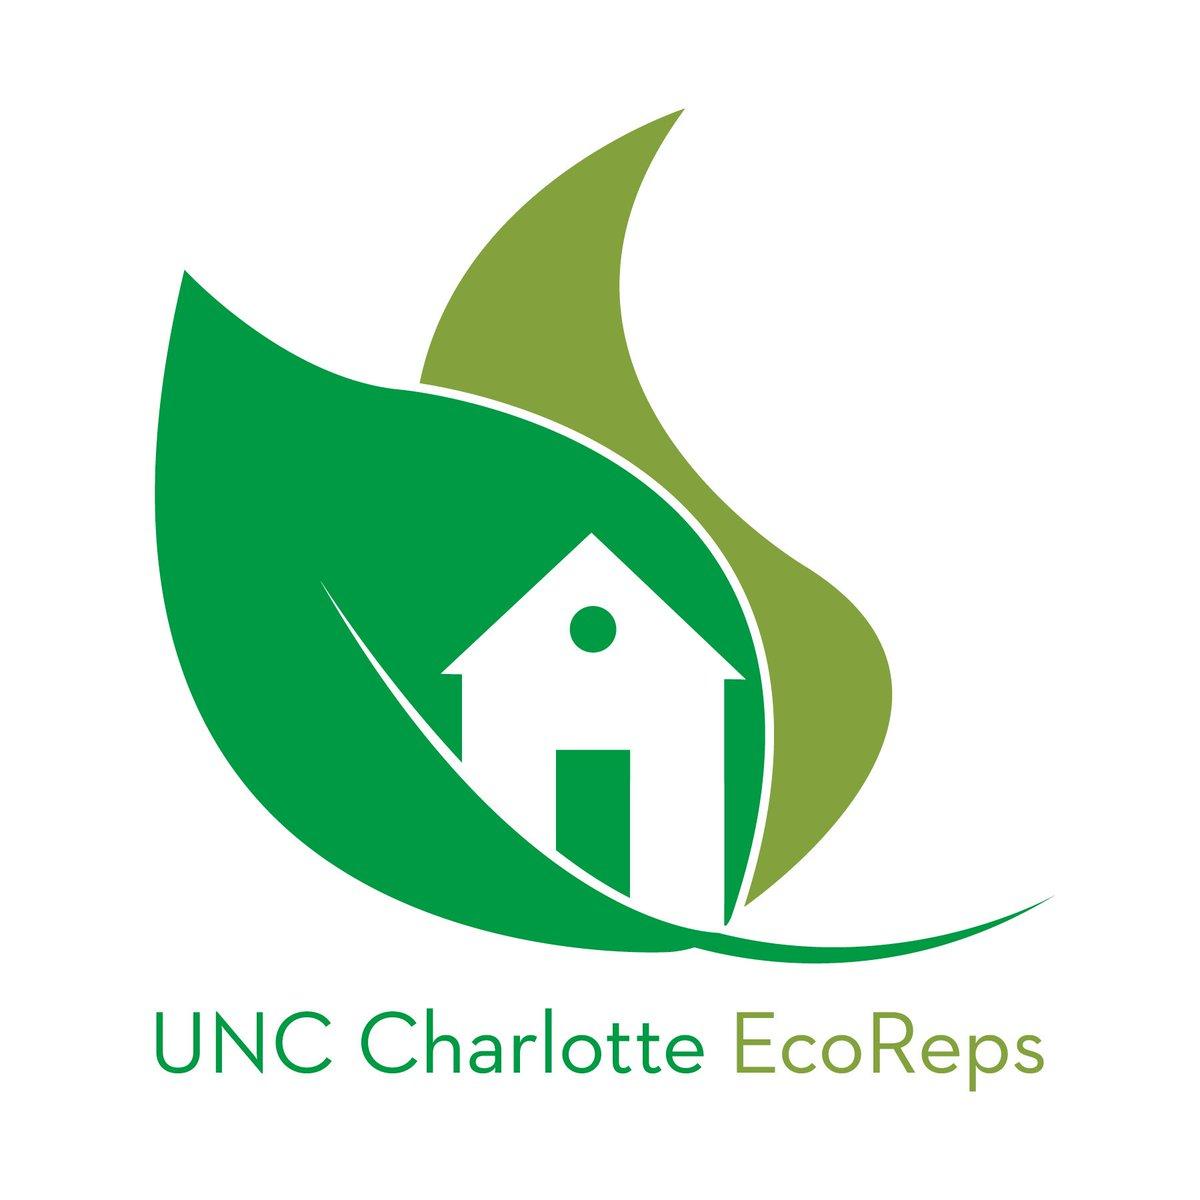 Uncc Logo Wwwtollebildcom